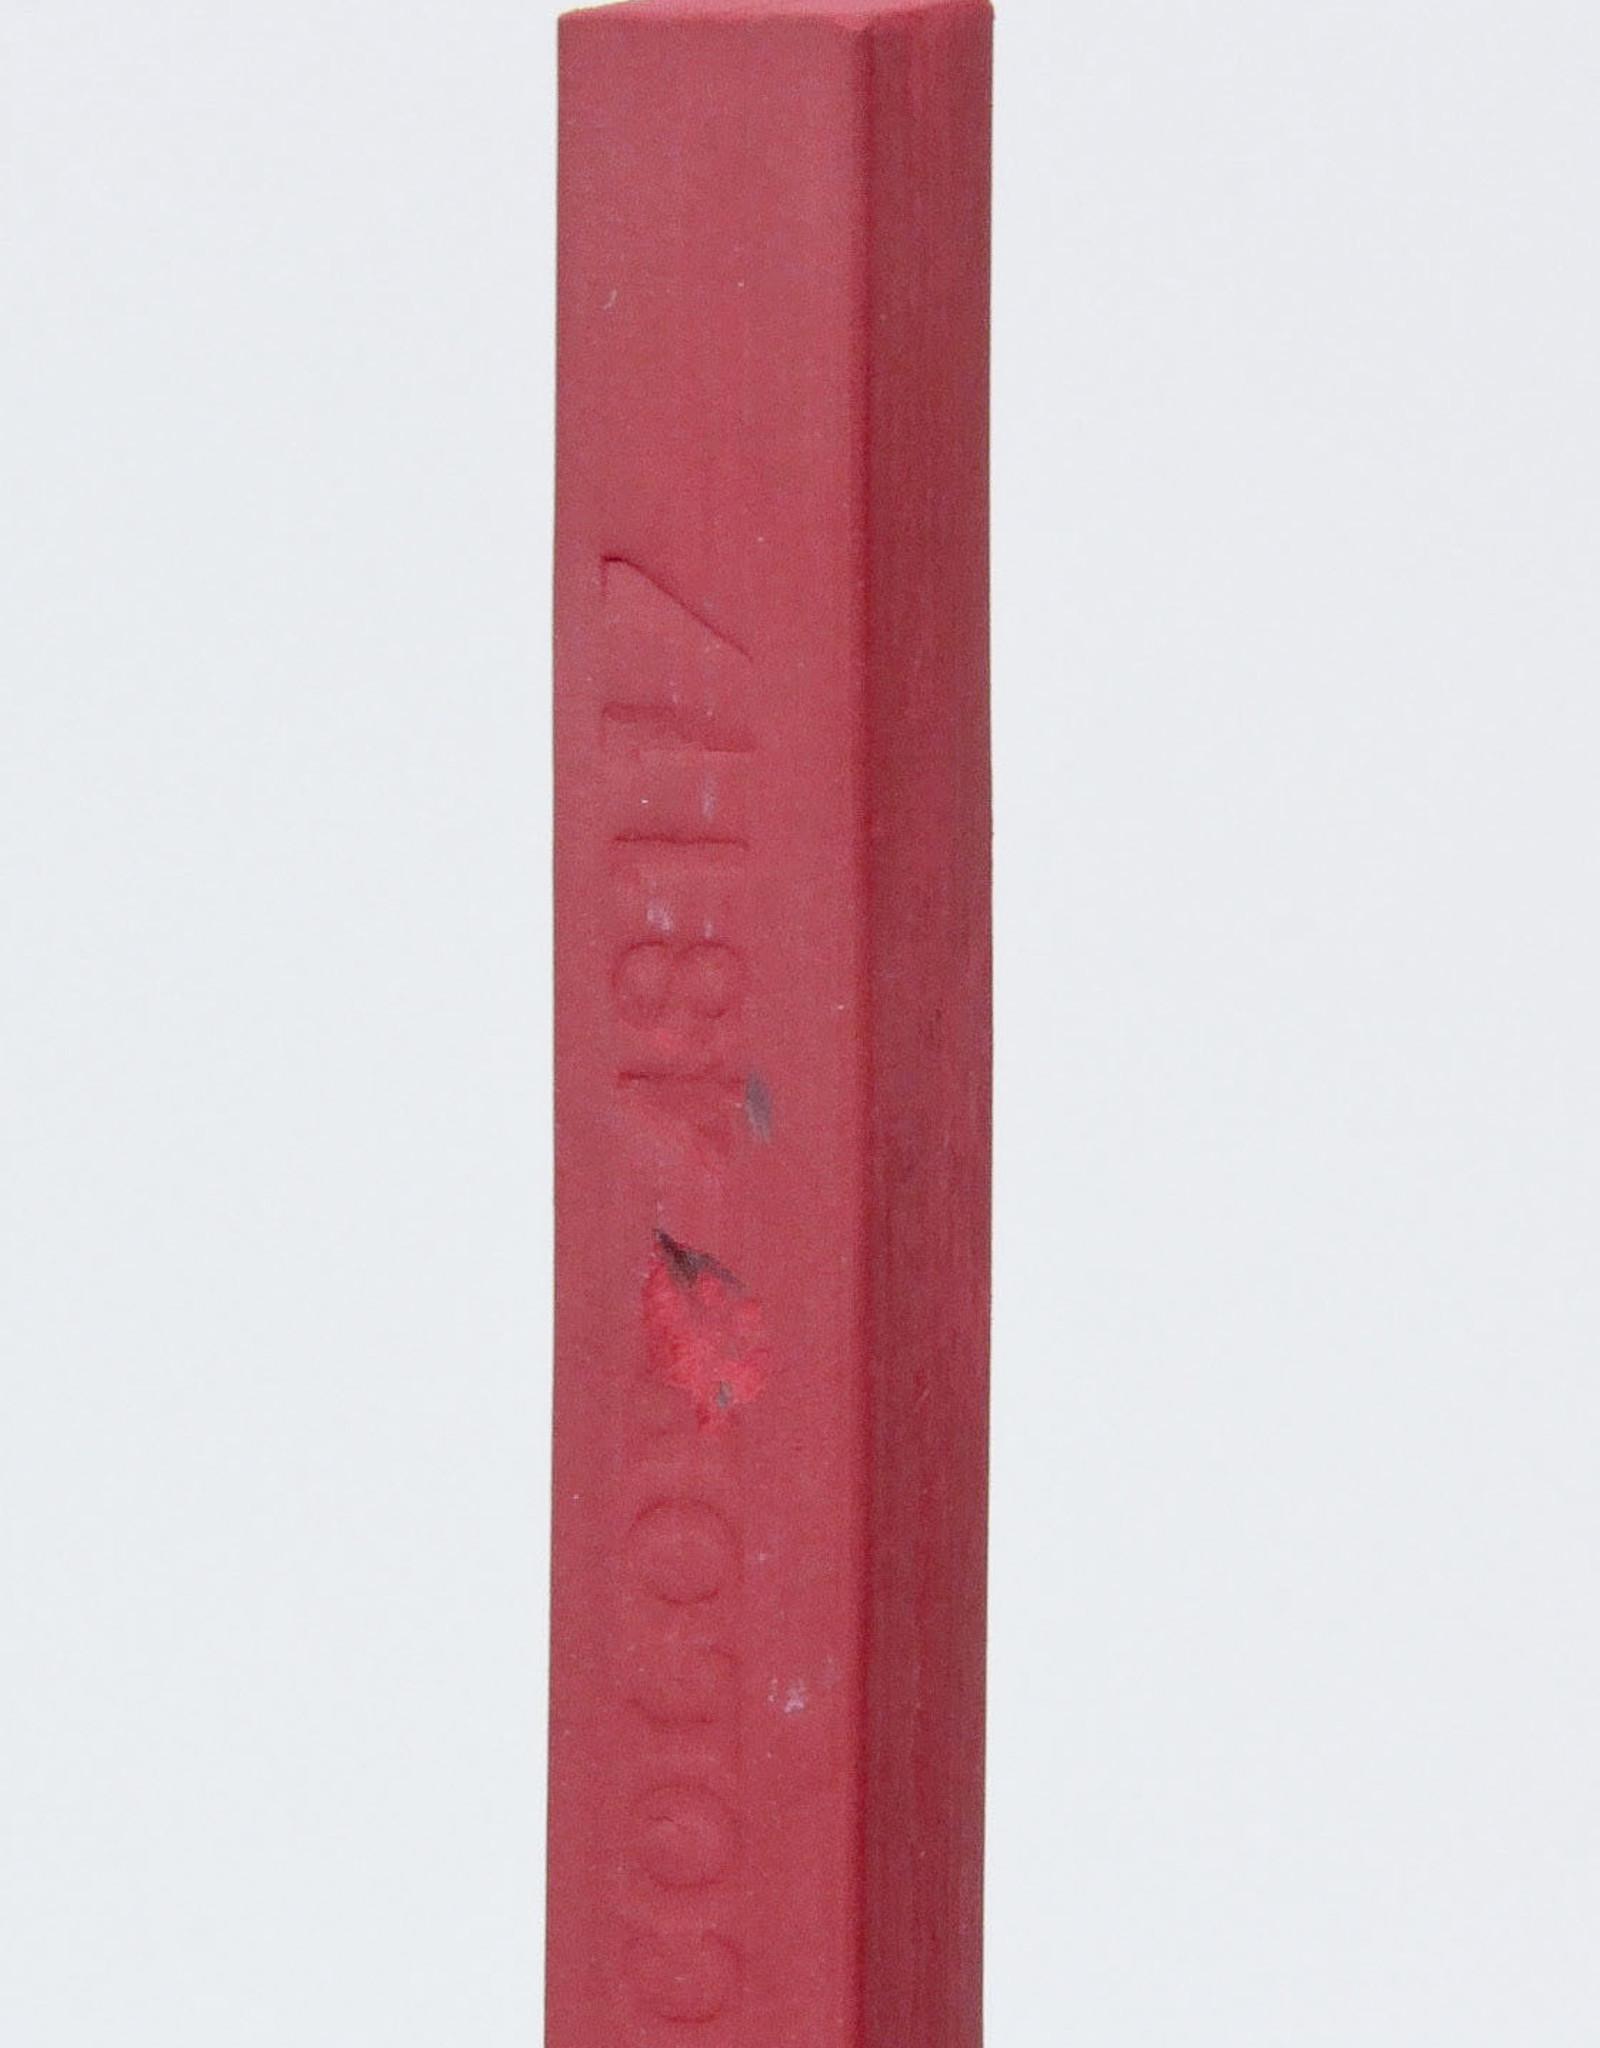 Cretacolor, Pastel Carre Stick, Madder Carmine